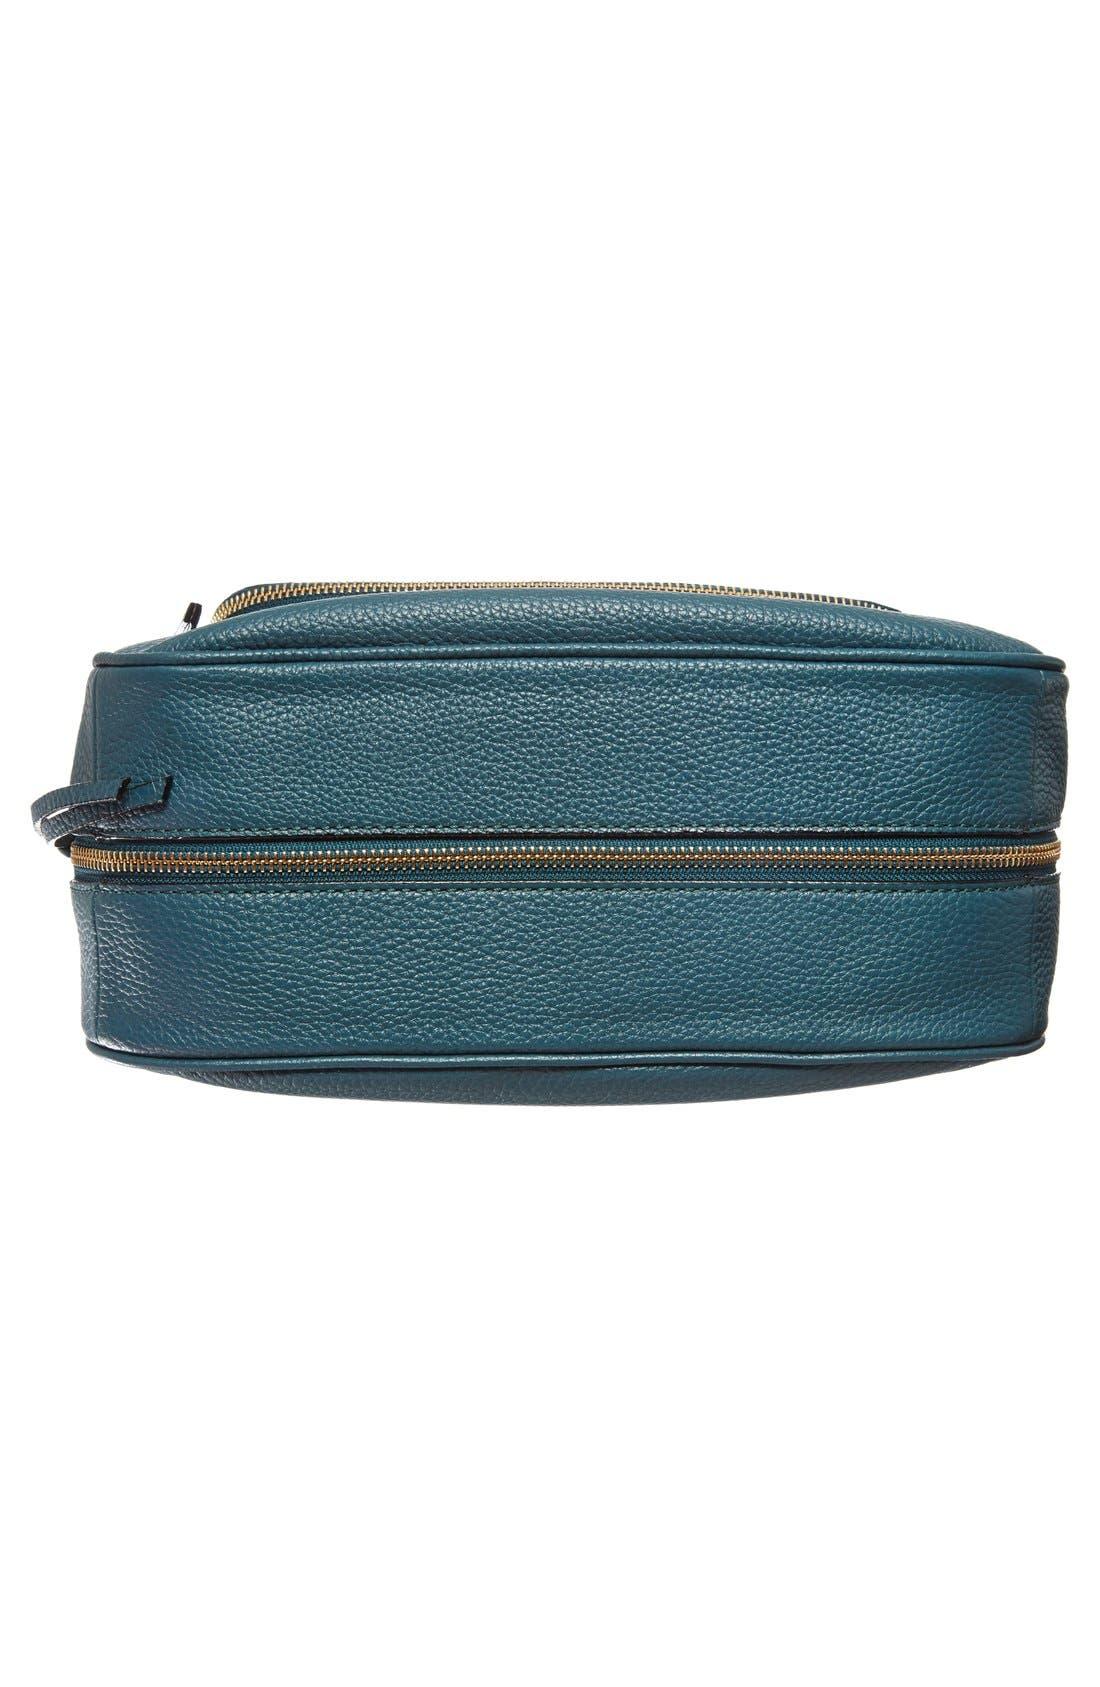 cobble hill - deva leather crossbody bag,                             Alternate thumbnail 42, color,